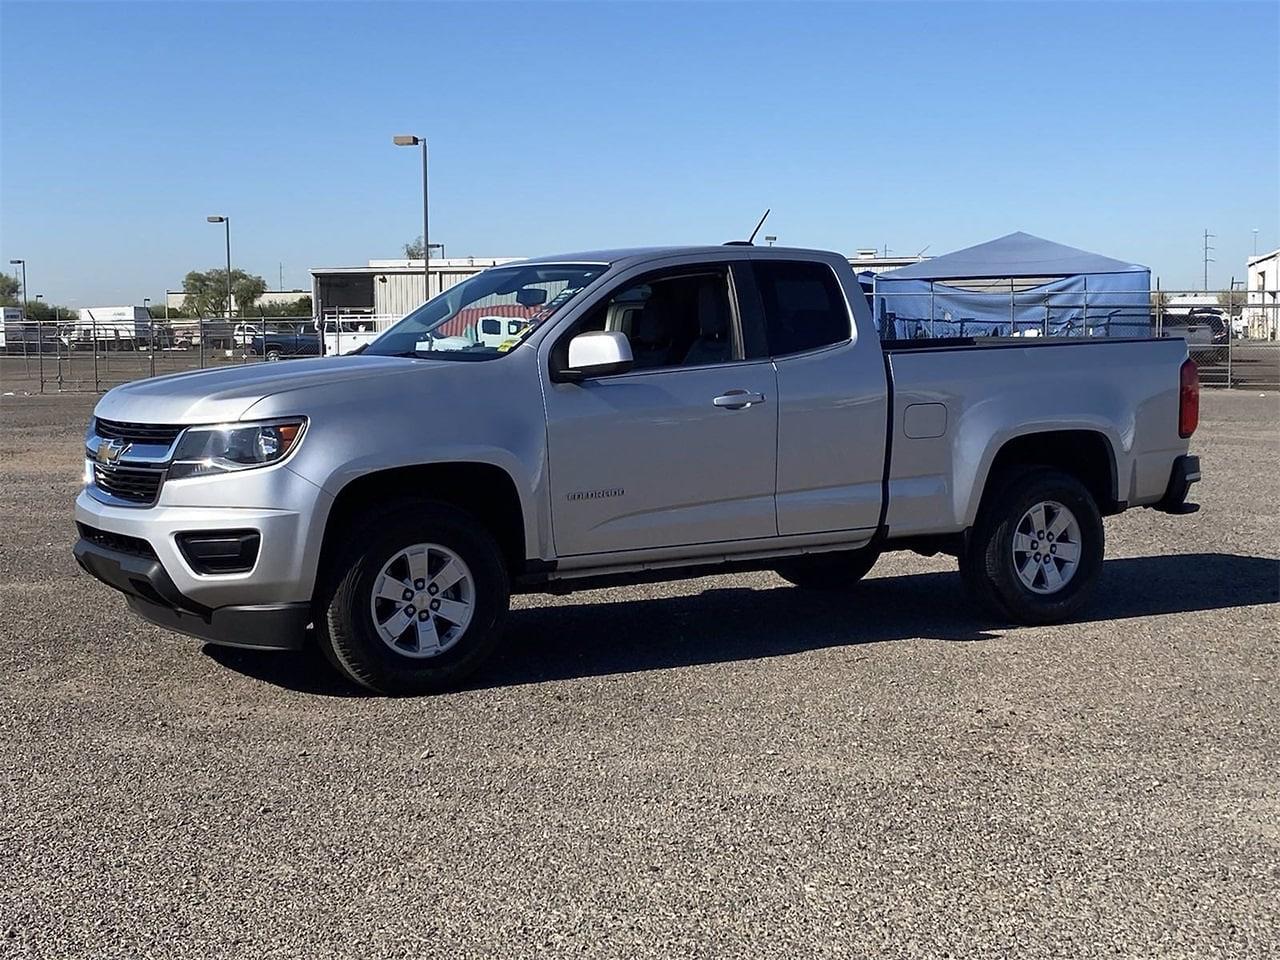 2019 Chevrolet Colorado Extended Cab 4x2, Pickup #CC8241 - photo 3